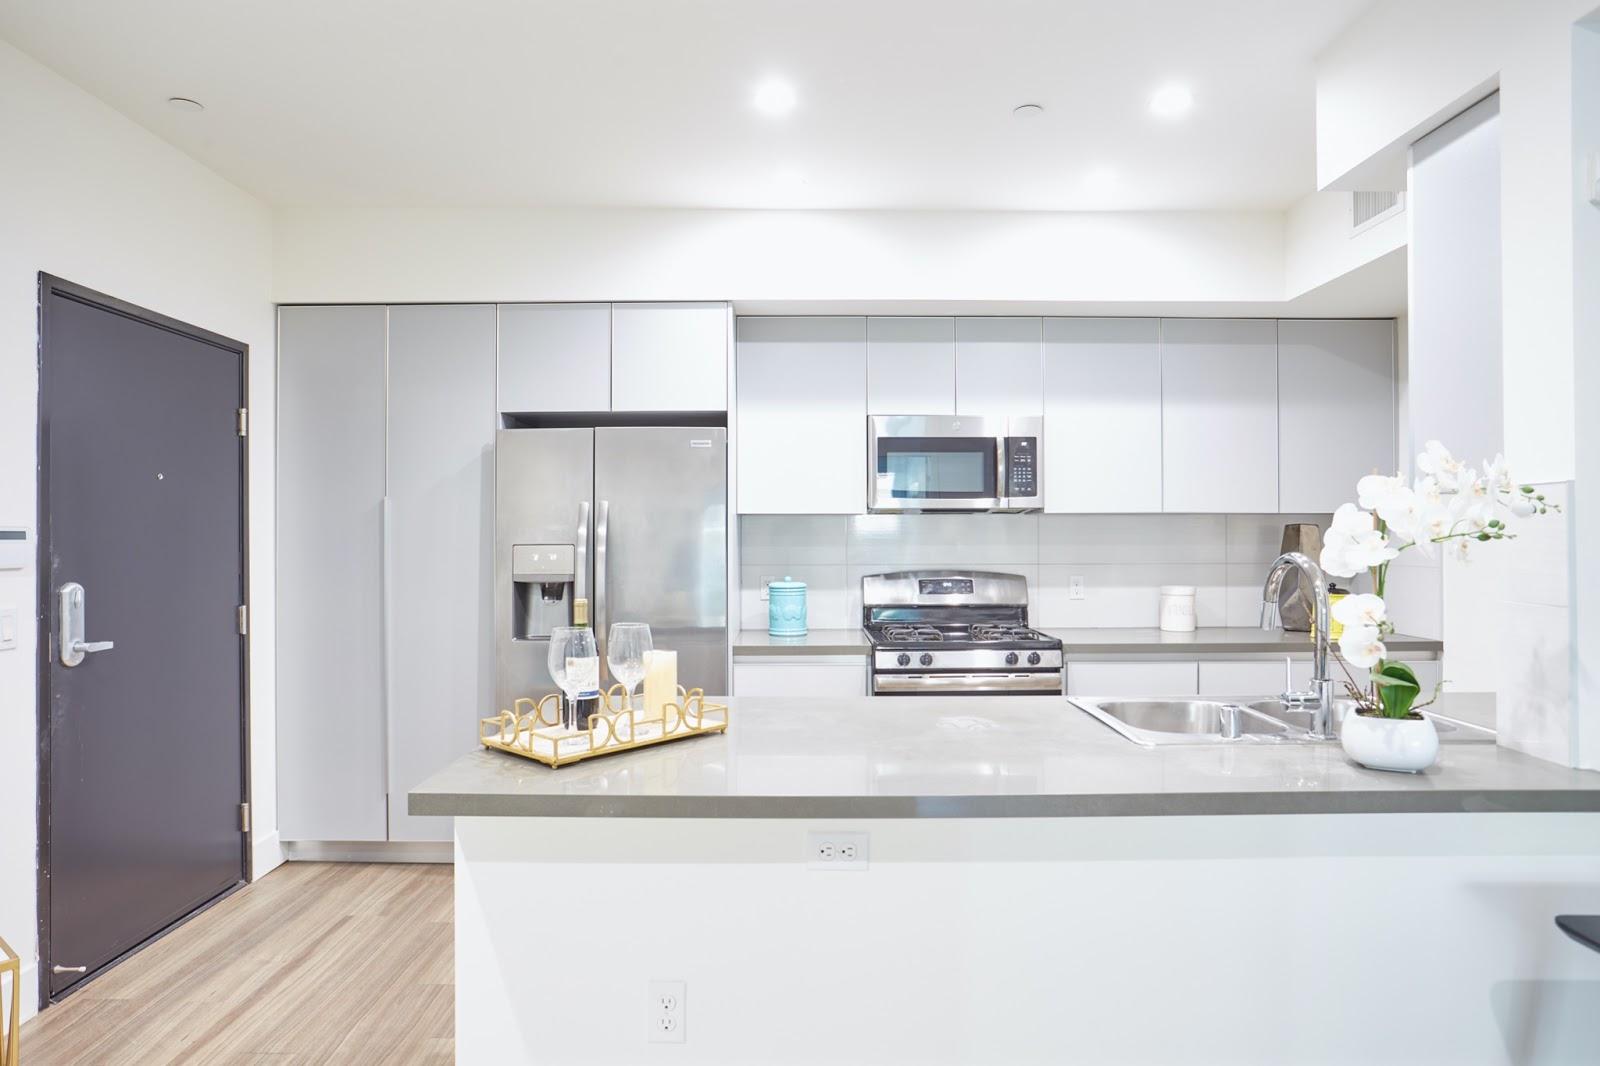 Tripalink studio apartment kitchen area